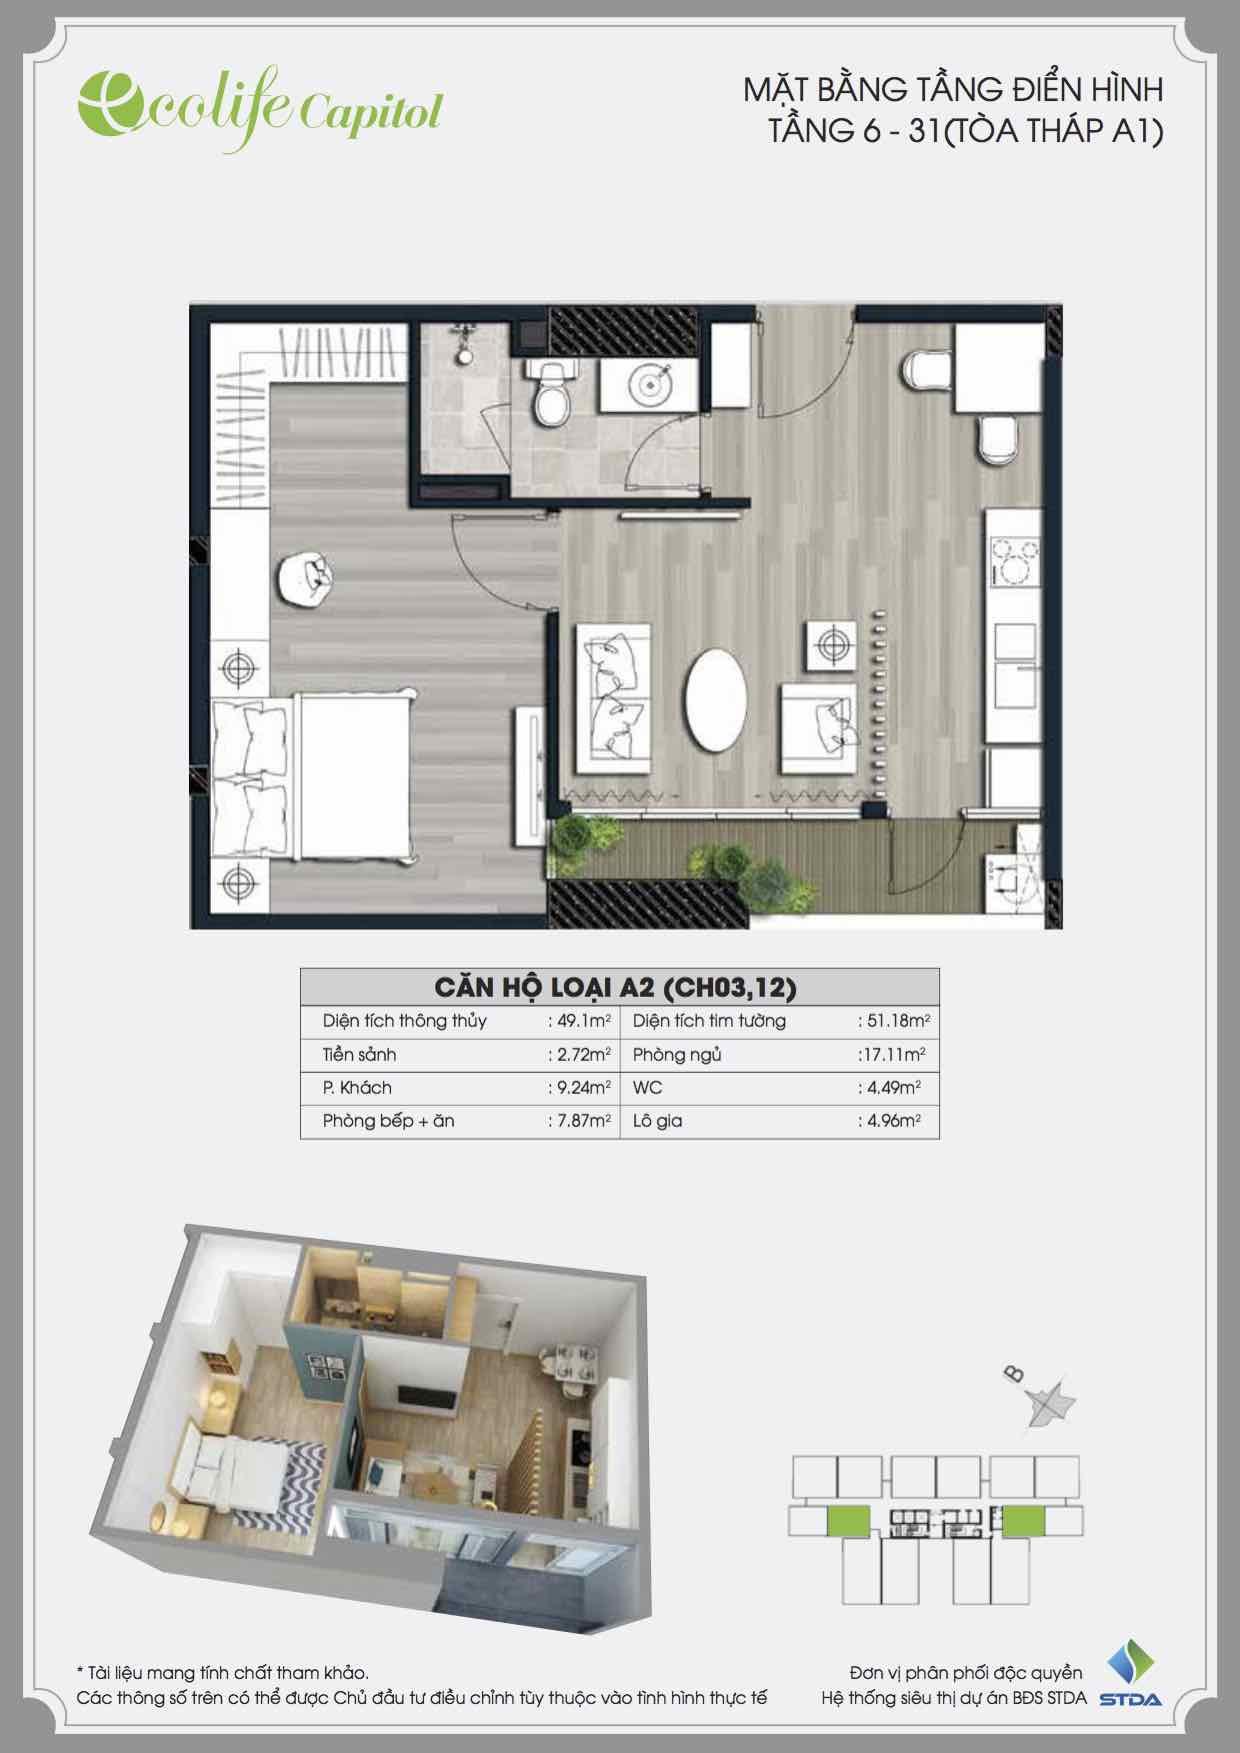 Thiết kế căn hộ A2 Ecolife Capitol